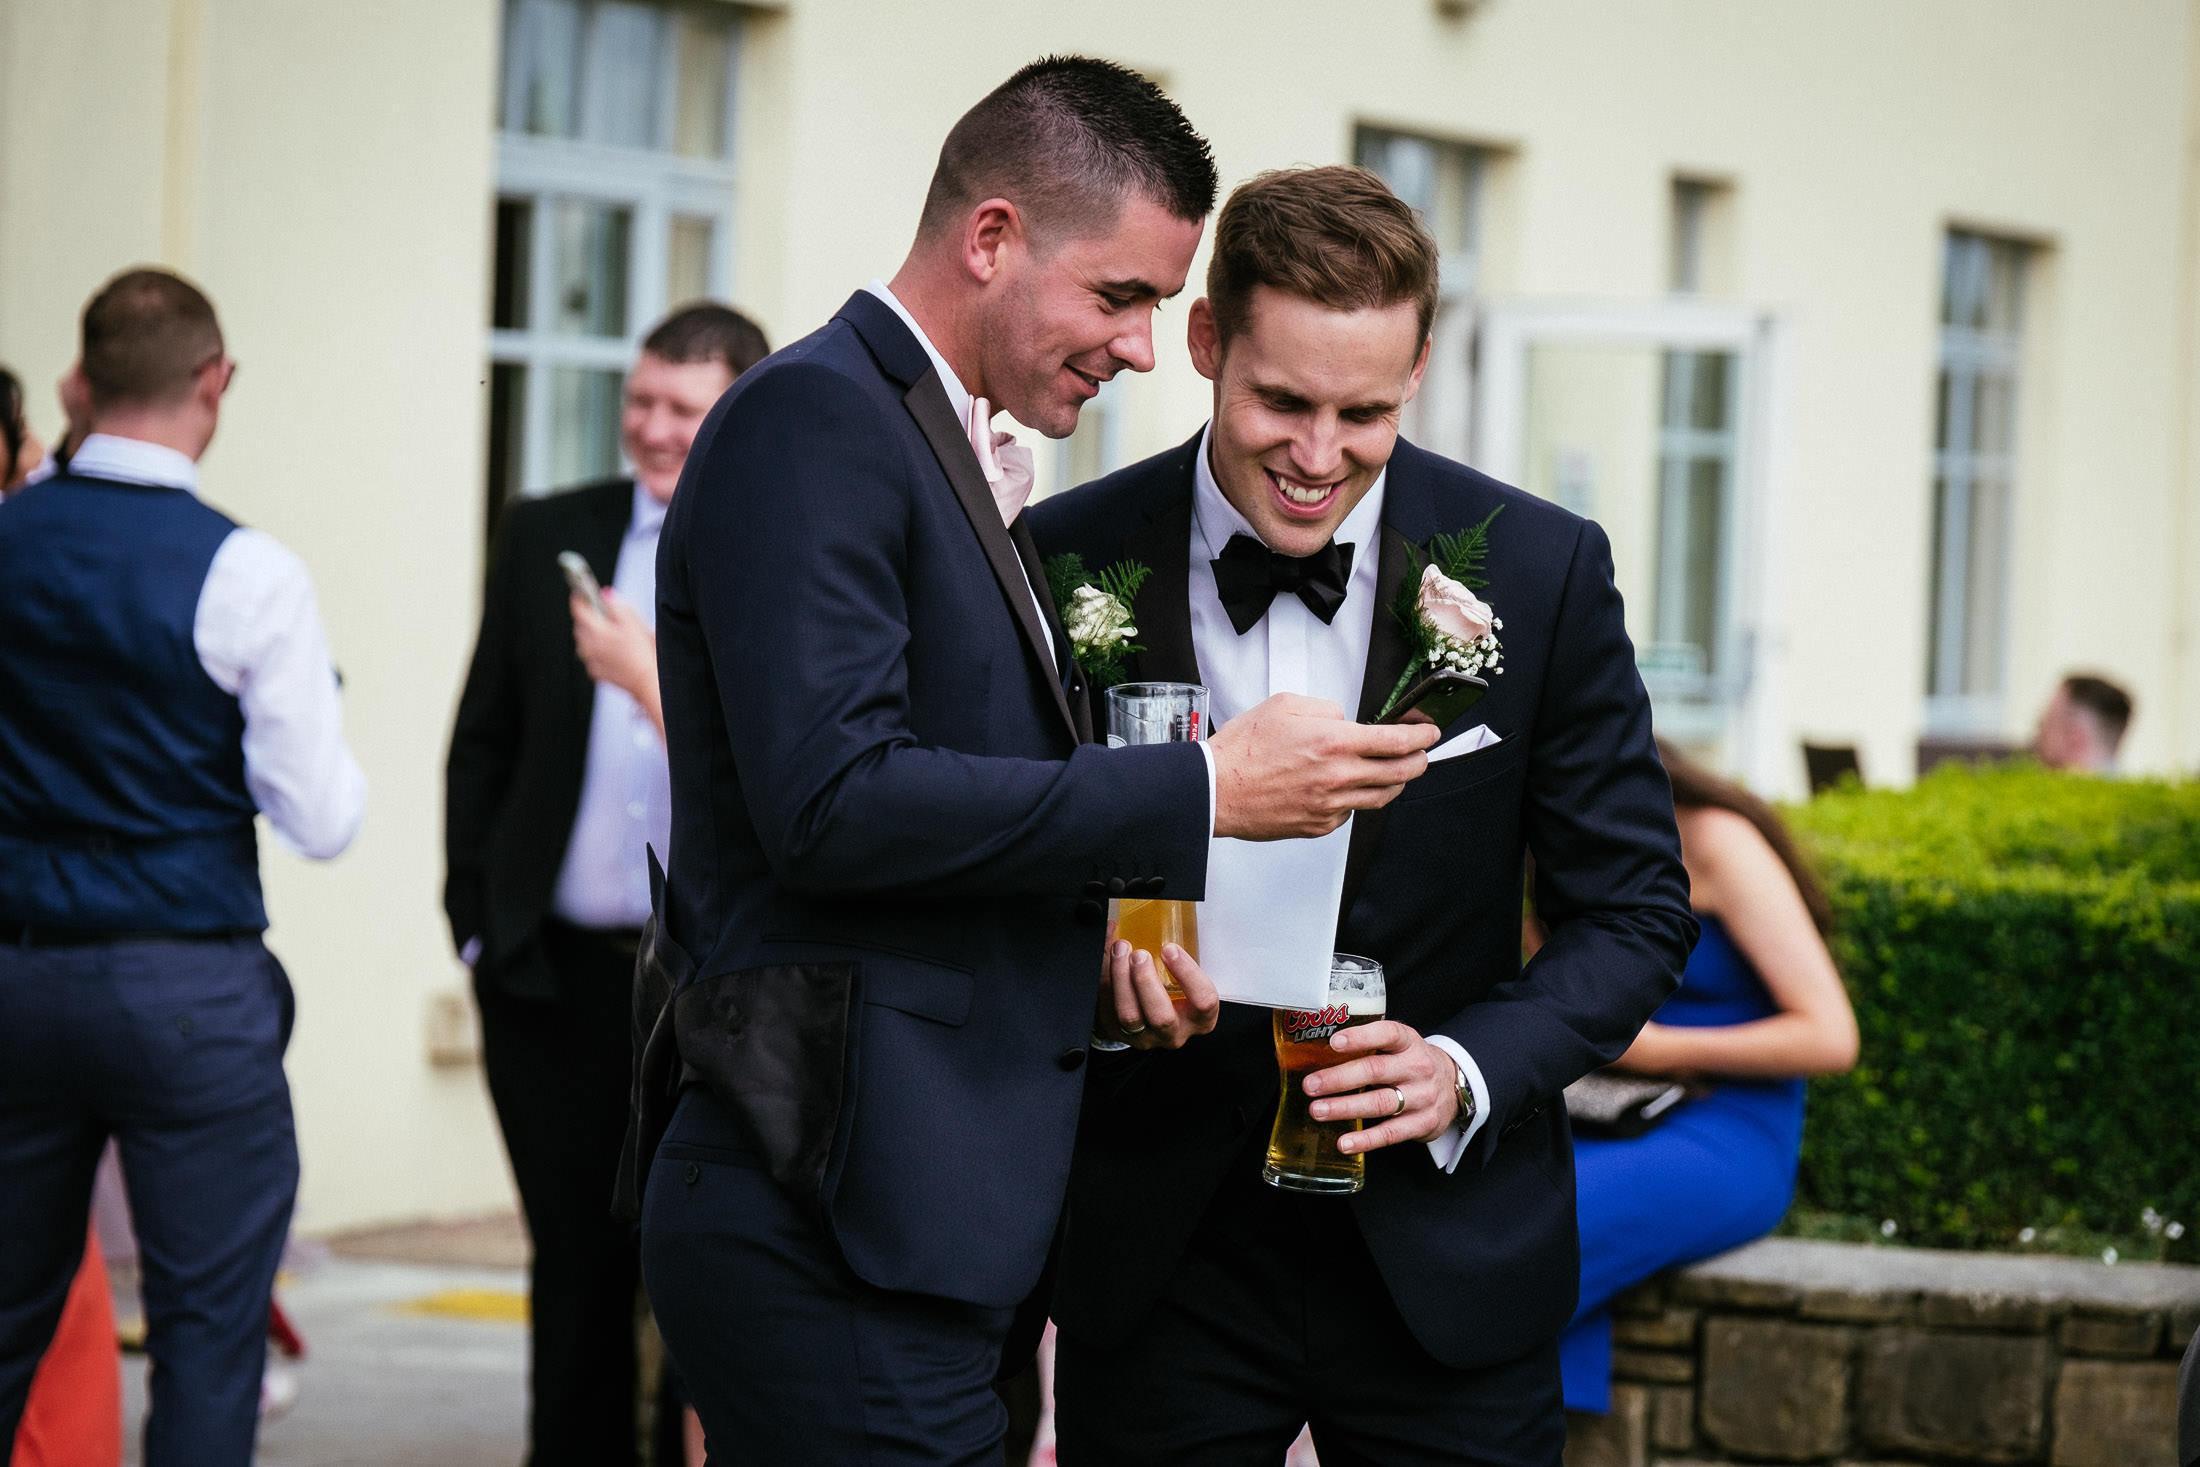 Knightsbrook Hotel Trim Castle Wedding Photographer 87